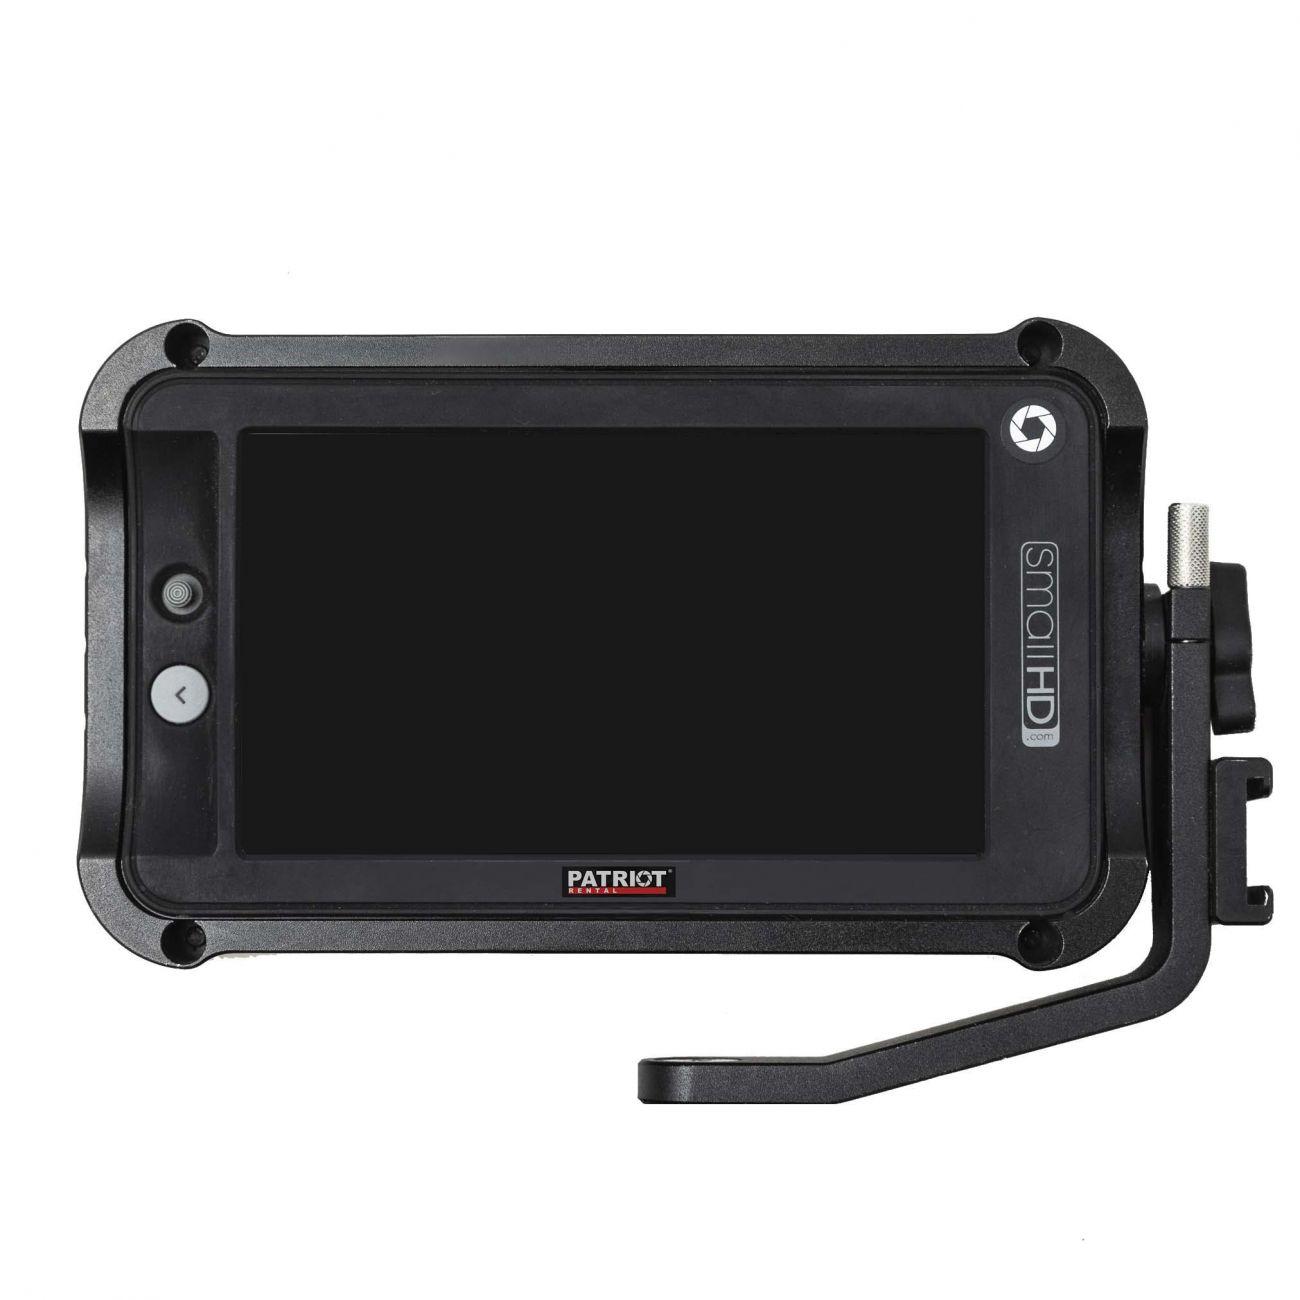 Monitor OnCamera 5″ SmallHD 502 Bright + battery